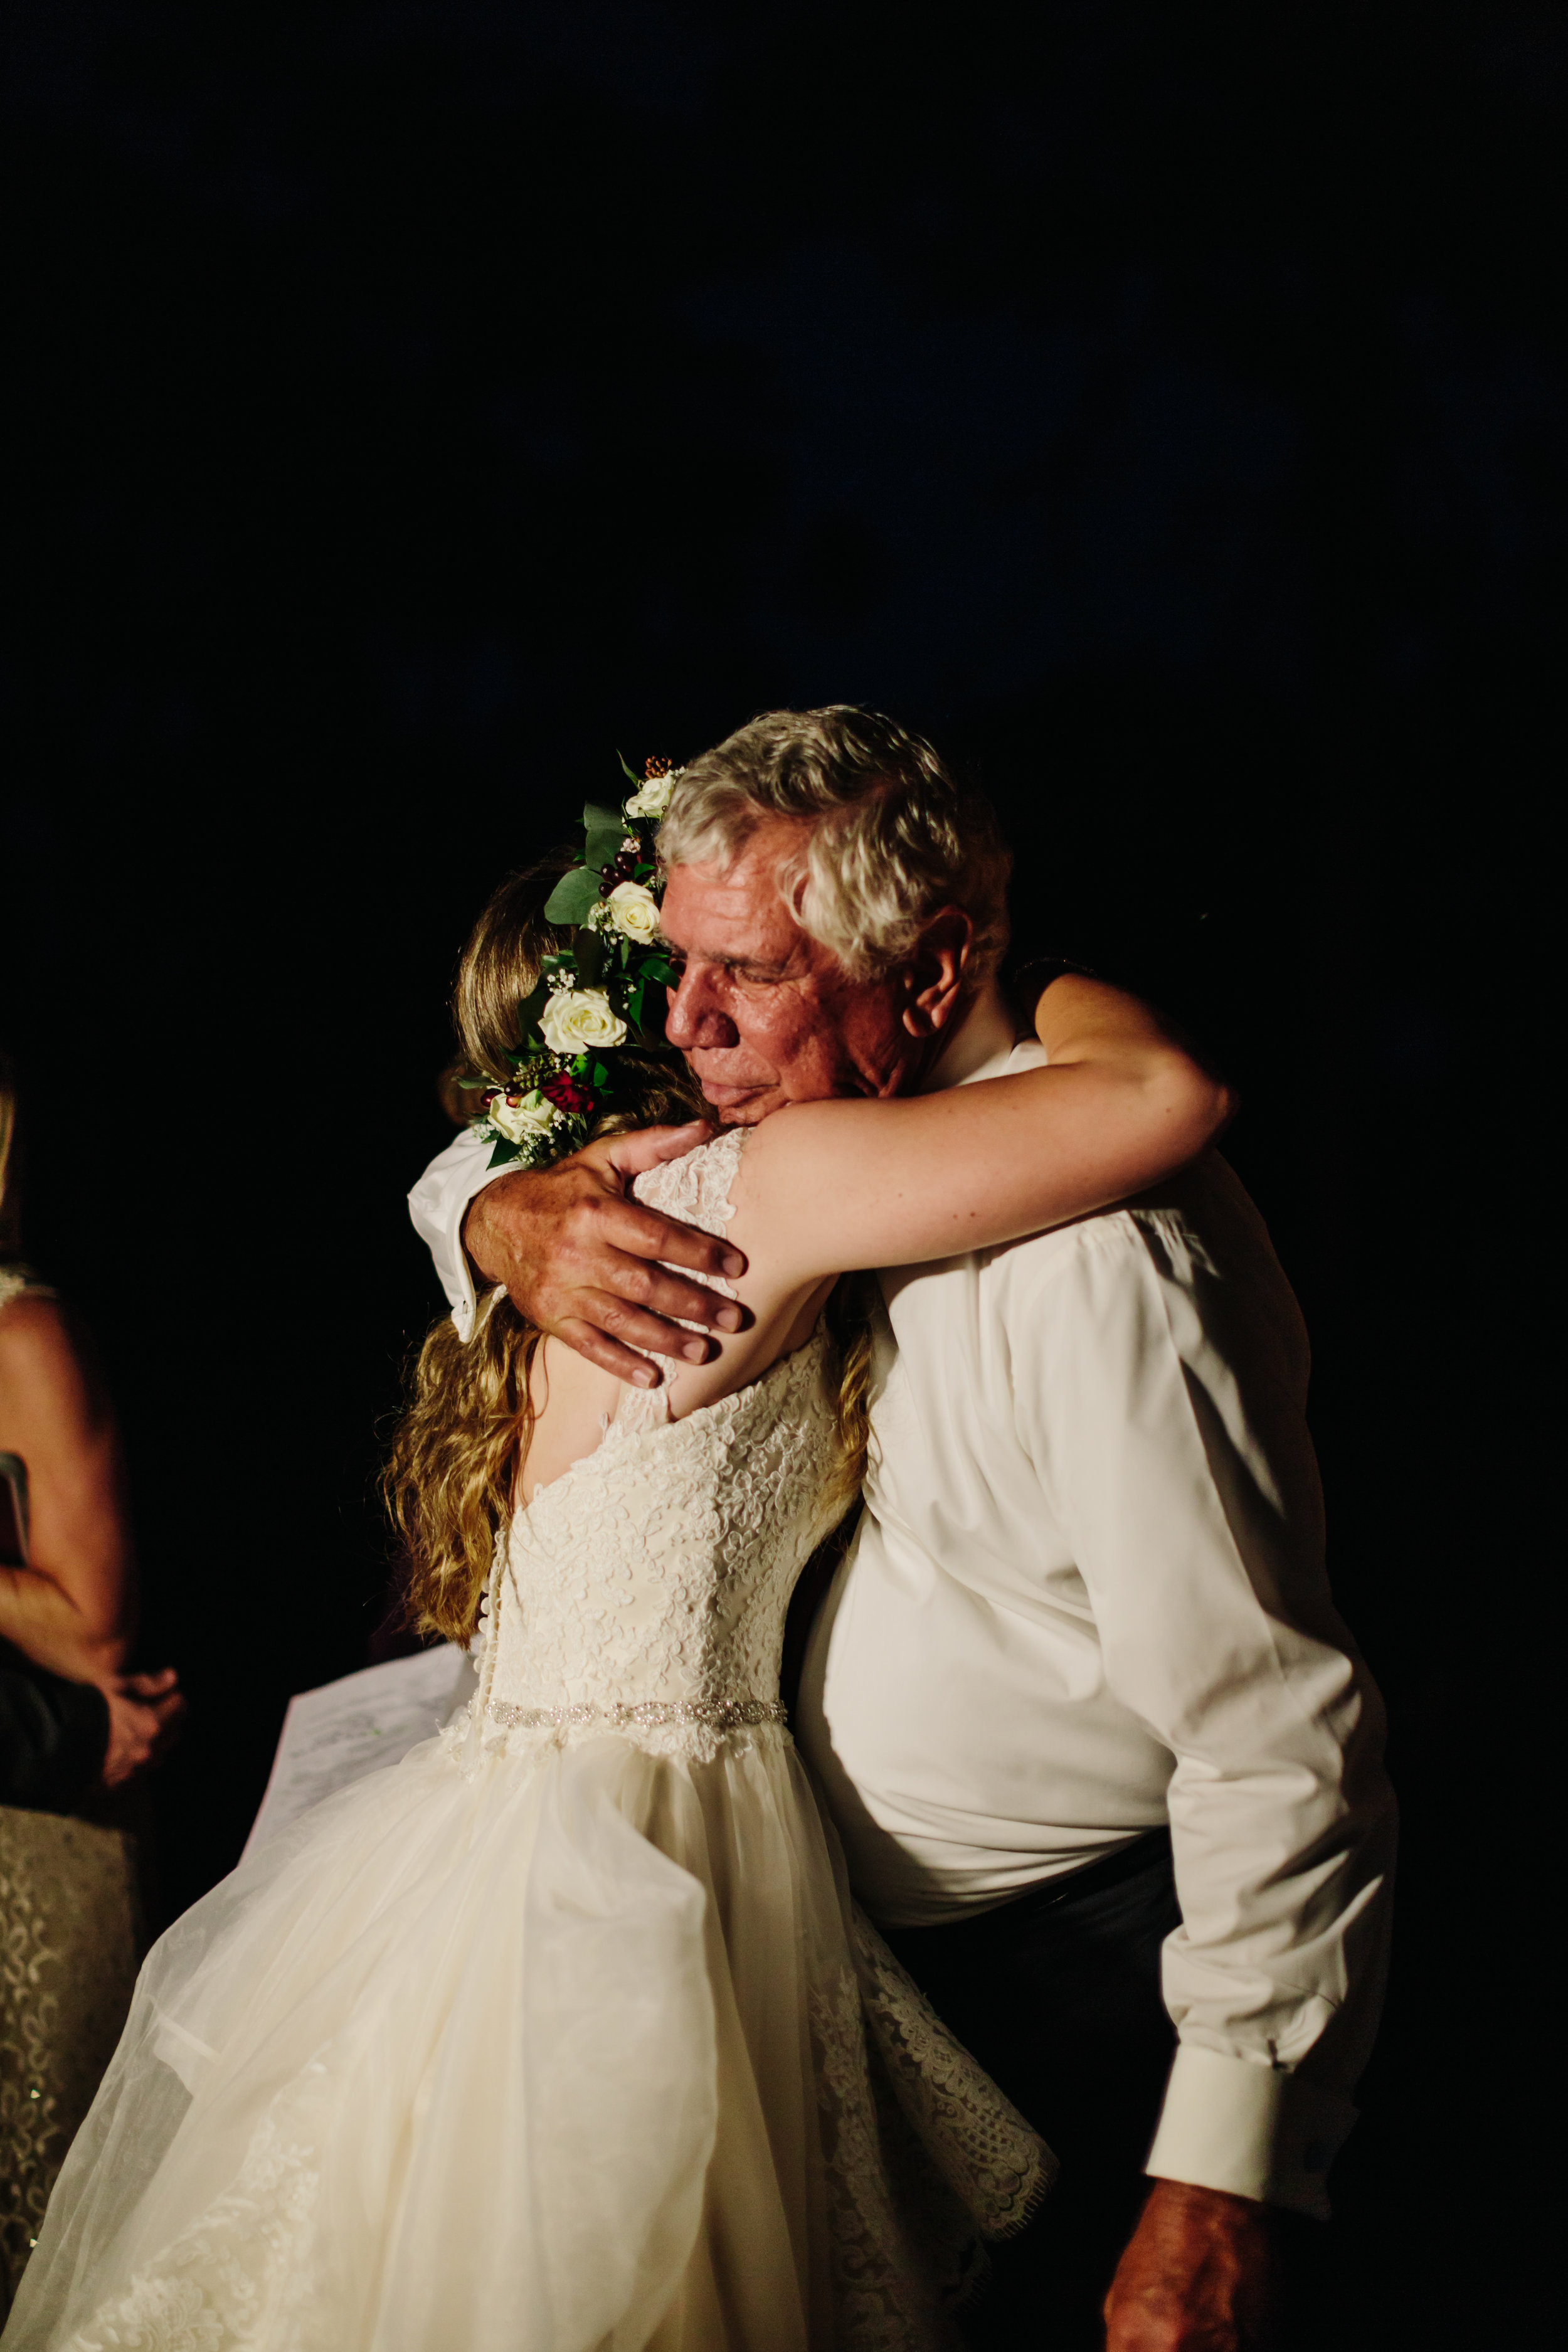 2018.04.14 Zak and Jamisyn Unrue Black Willow Barn Wedding Finals-862.jpg